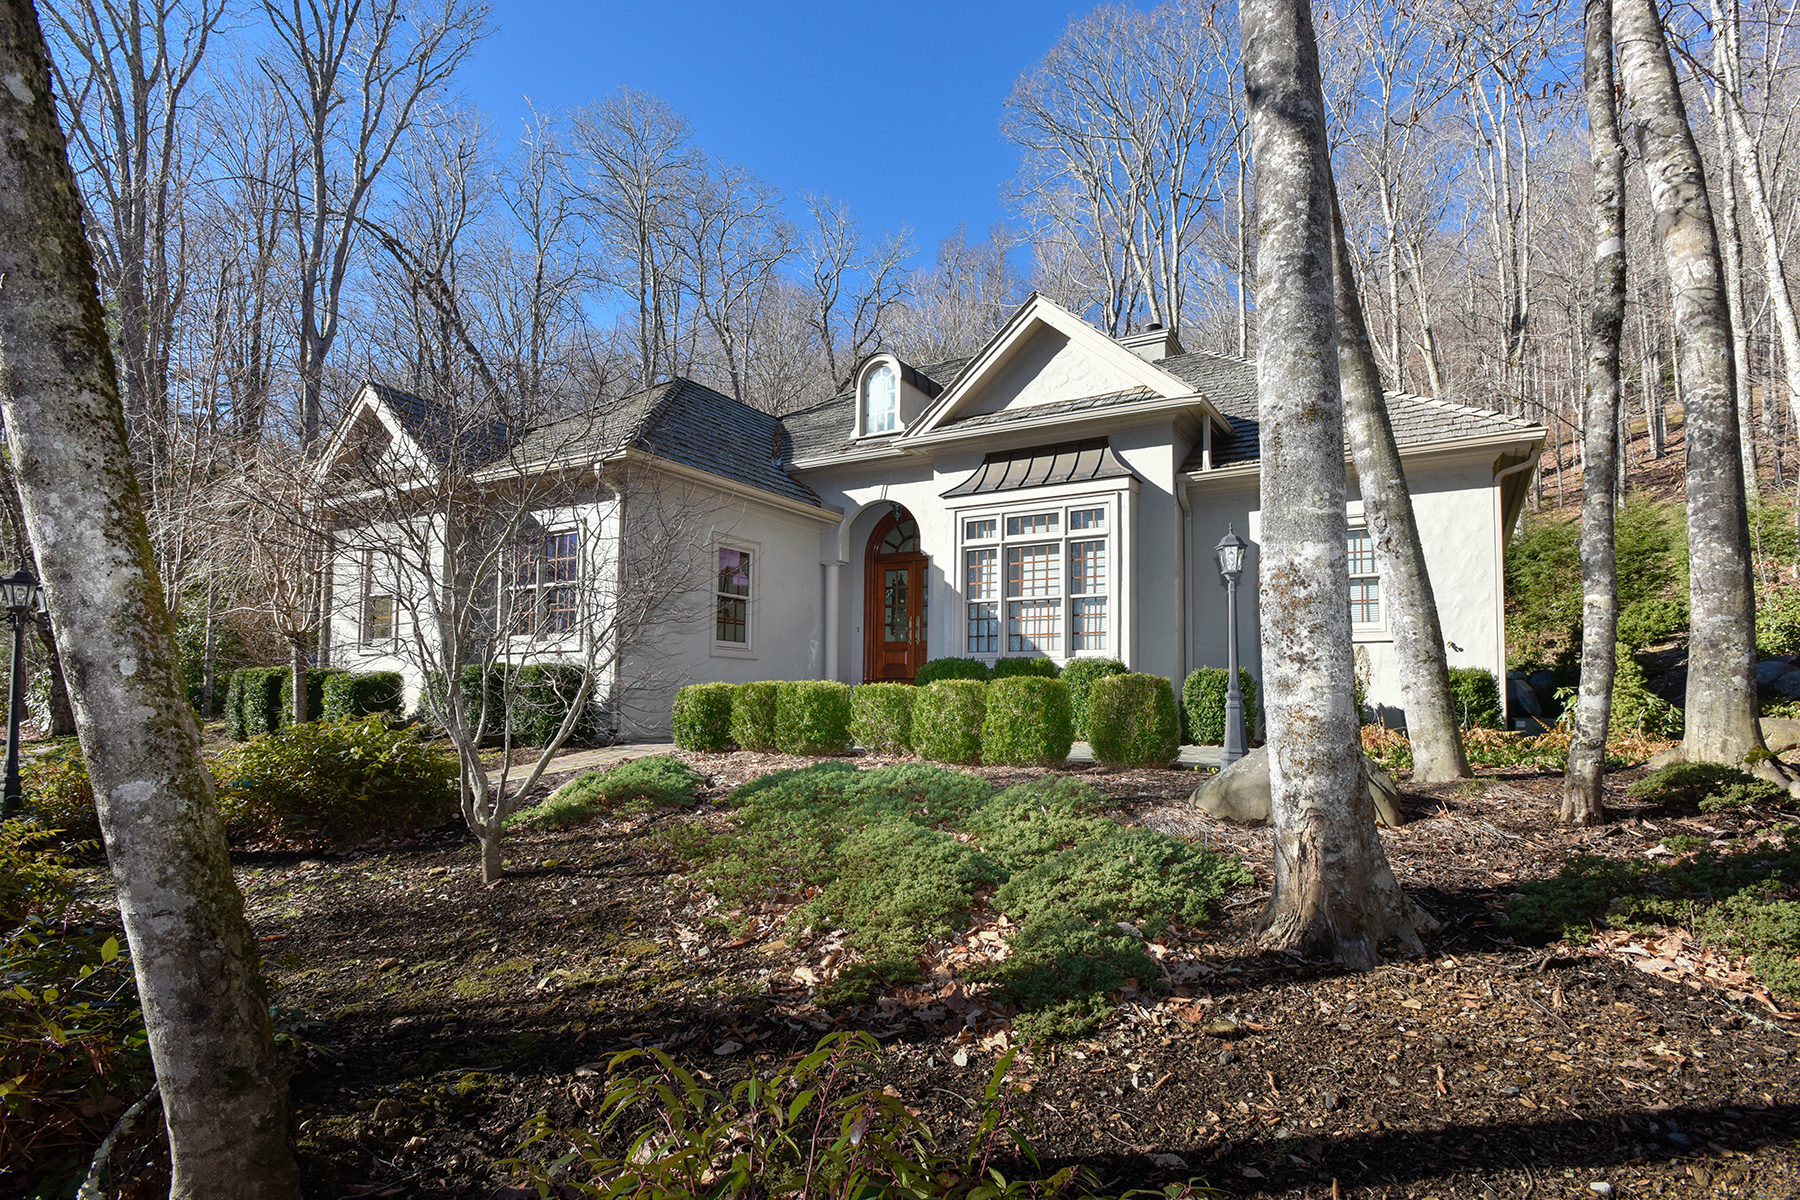 Single Family Home for Sale at LINVILLE - LINVILLE RIDGE 109 Rock Ledge Lane Linville, North Carolina, 28646 United States